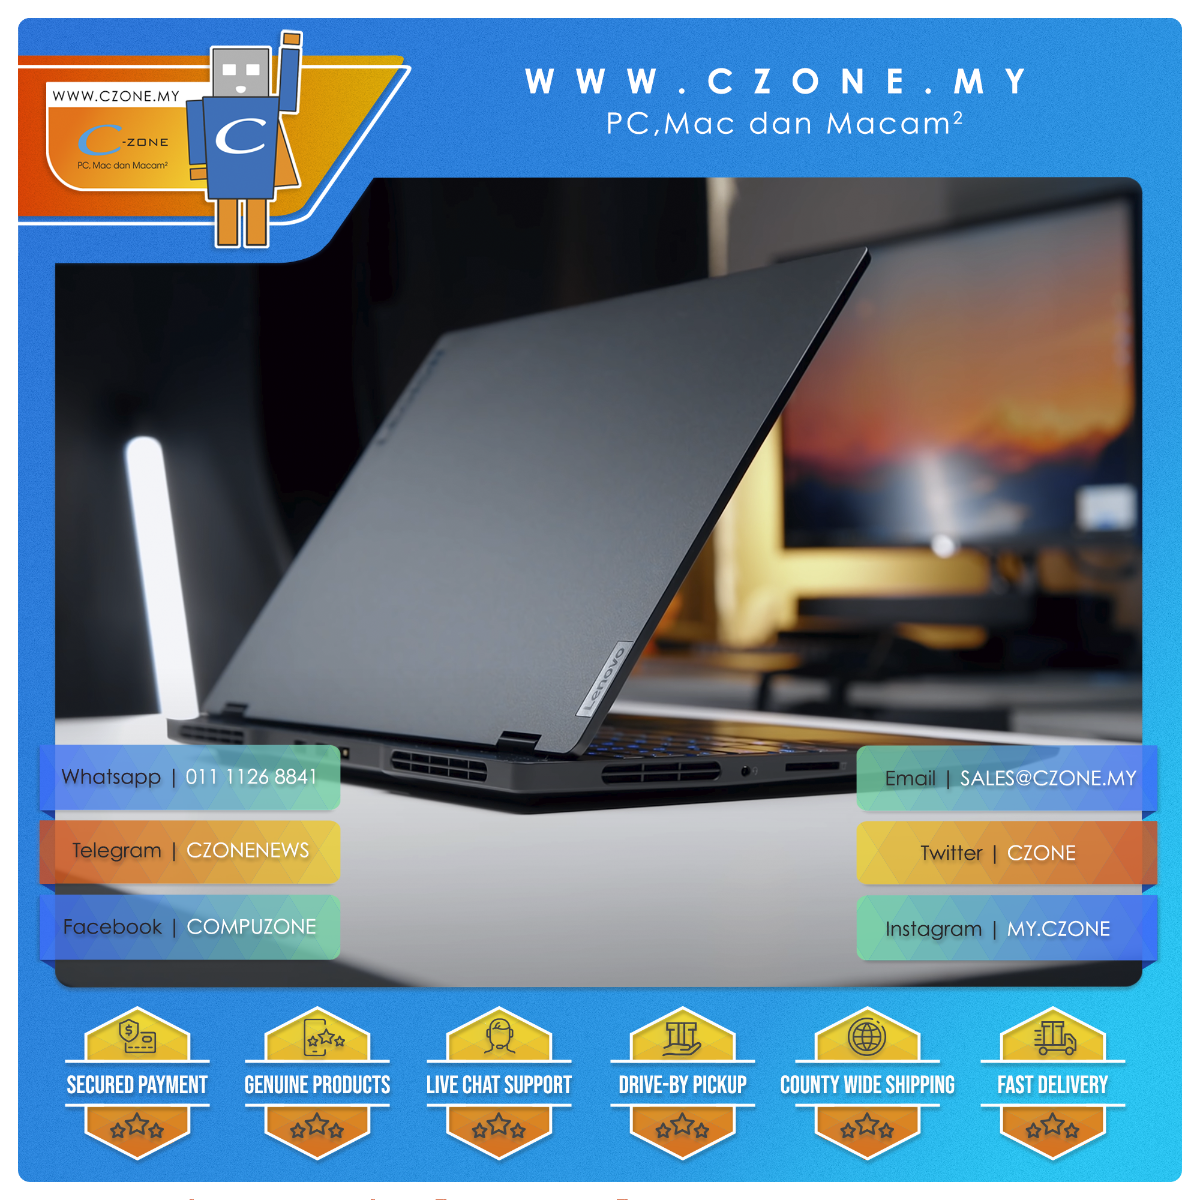 https://czone.my/czone/lenovo-ideapad-5-pro-82l5008jmj-laptop-15-6-r7-5800h-2-1ghz-16gb-1tb-ssd-gtx-1650-win-10-office-h-s-storm-grey.html